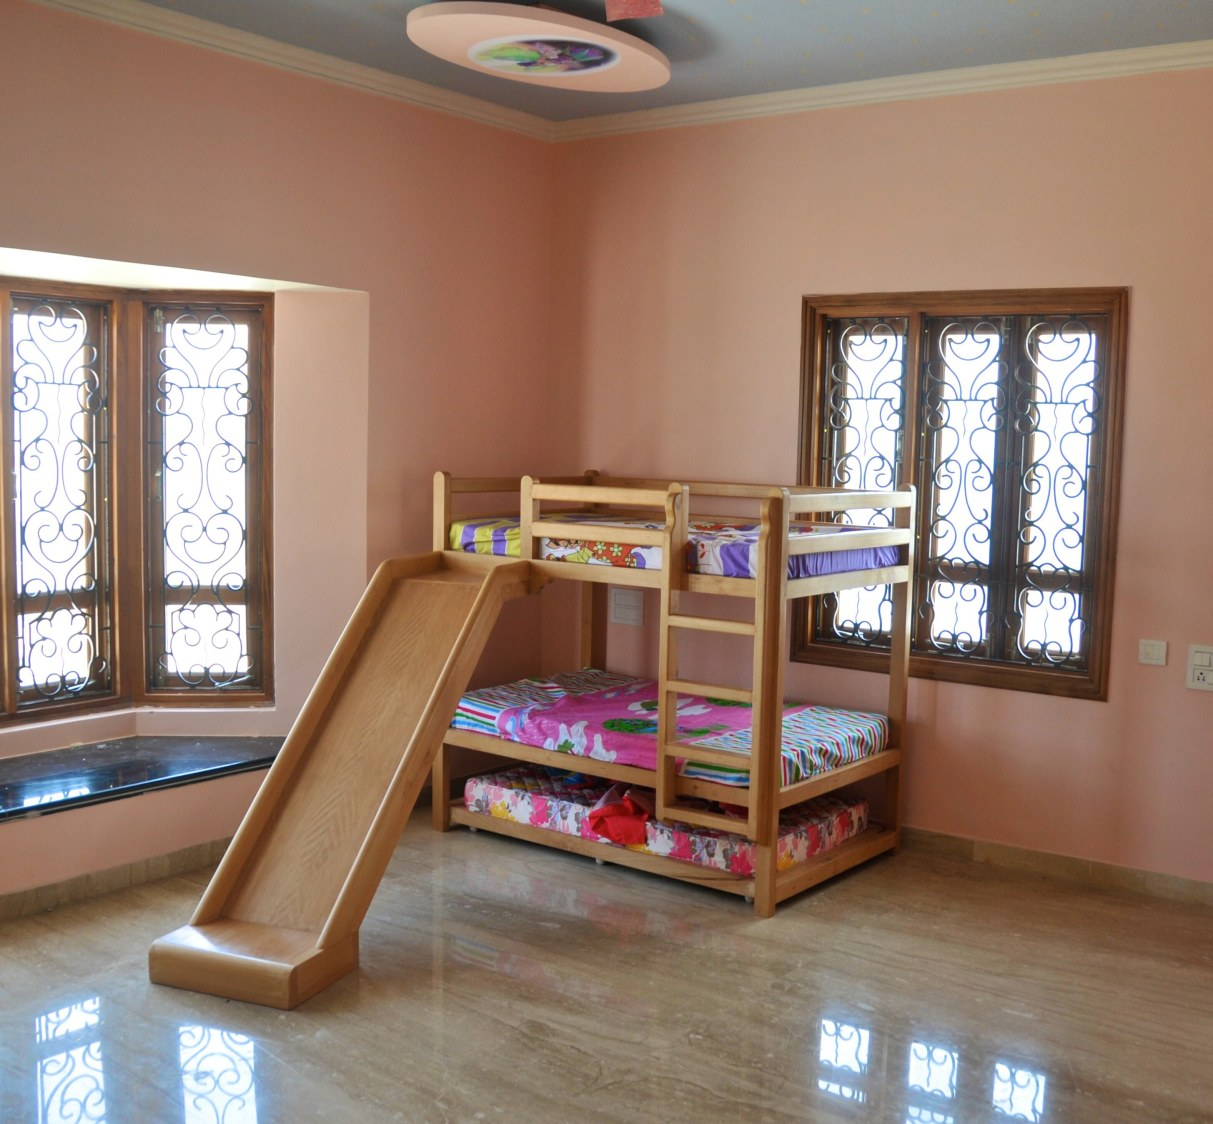 Wooden Bunk Bed With Slide For Kid's Bedroom by Viraf Laskari  Bedroom Contemporary | Interior Design Photos & Ideas